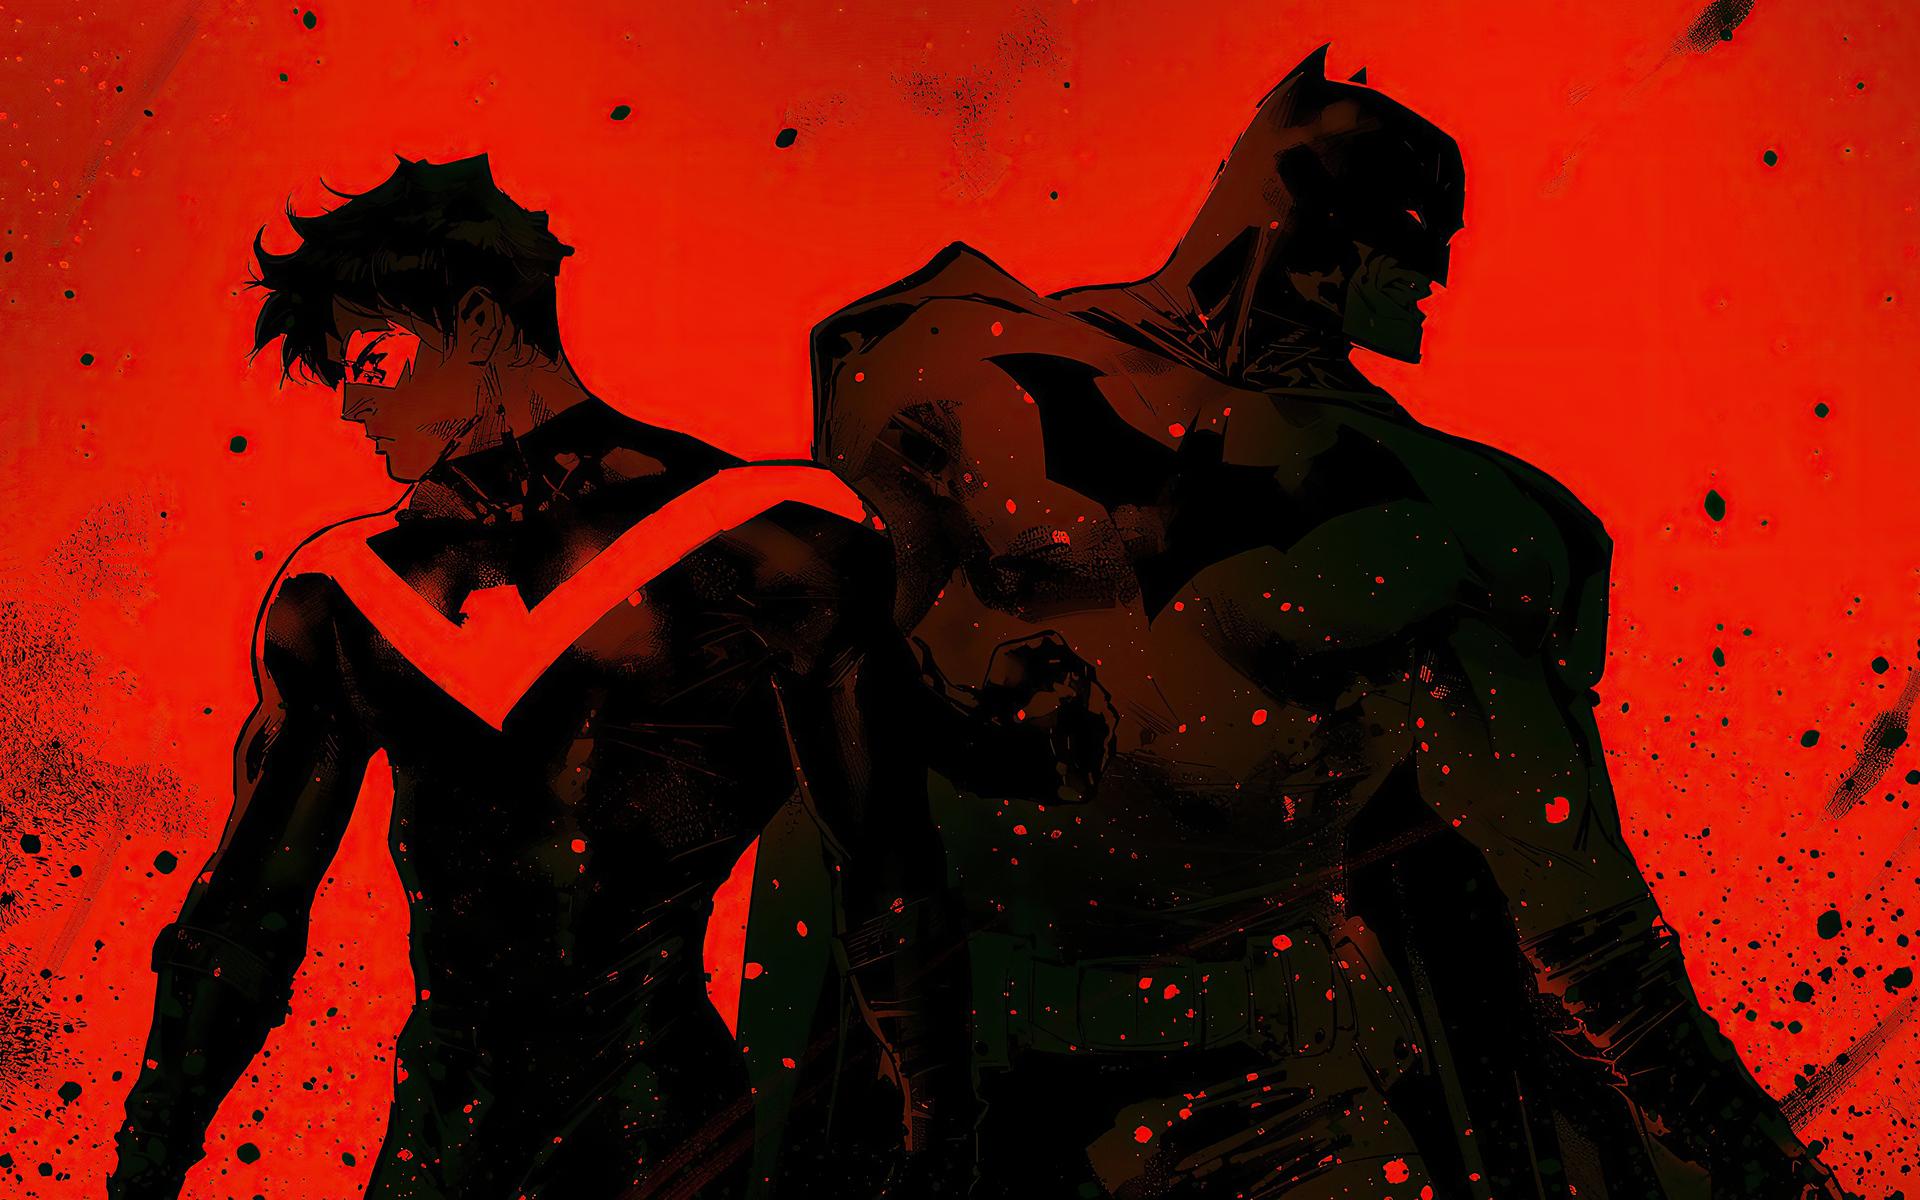 batman-nd-nightwing-4k-e0.jpg